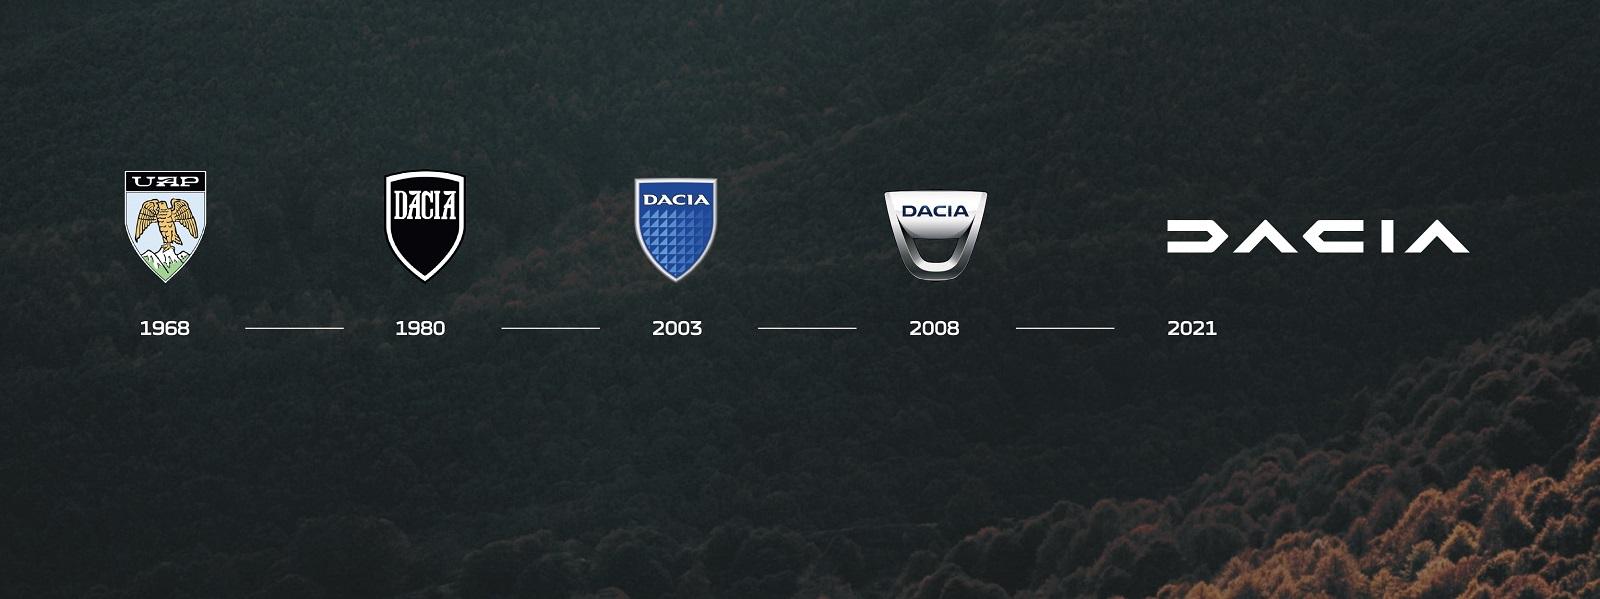 Story Dacia 2